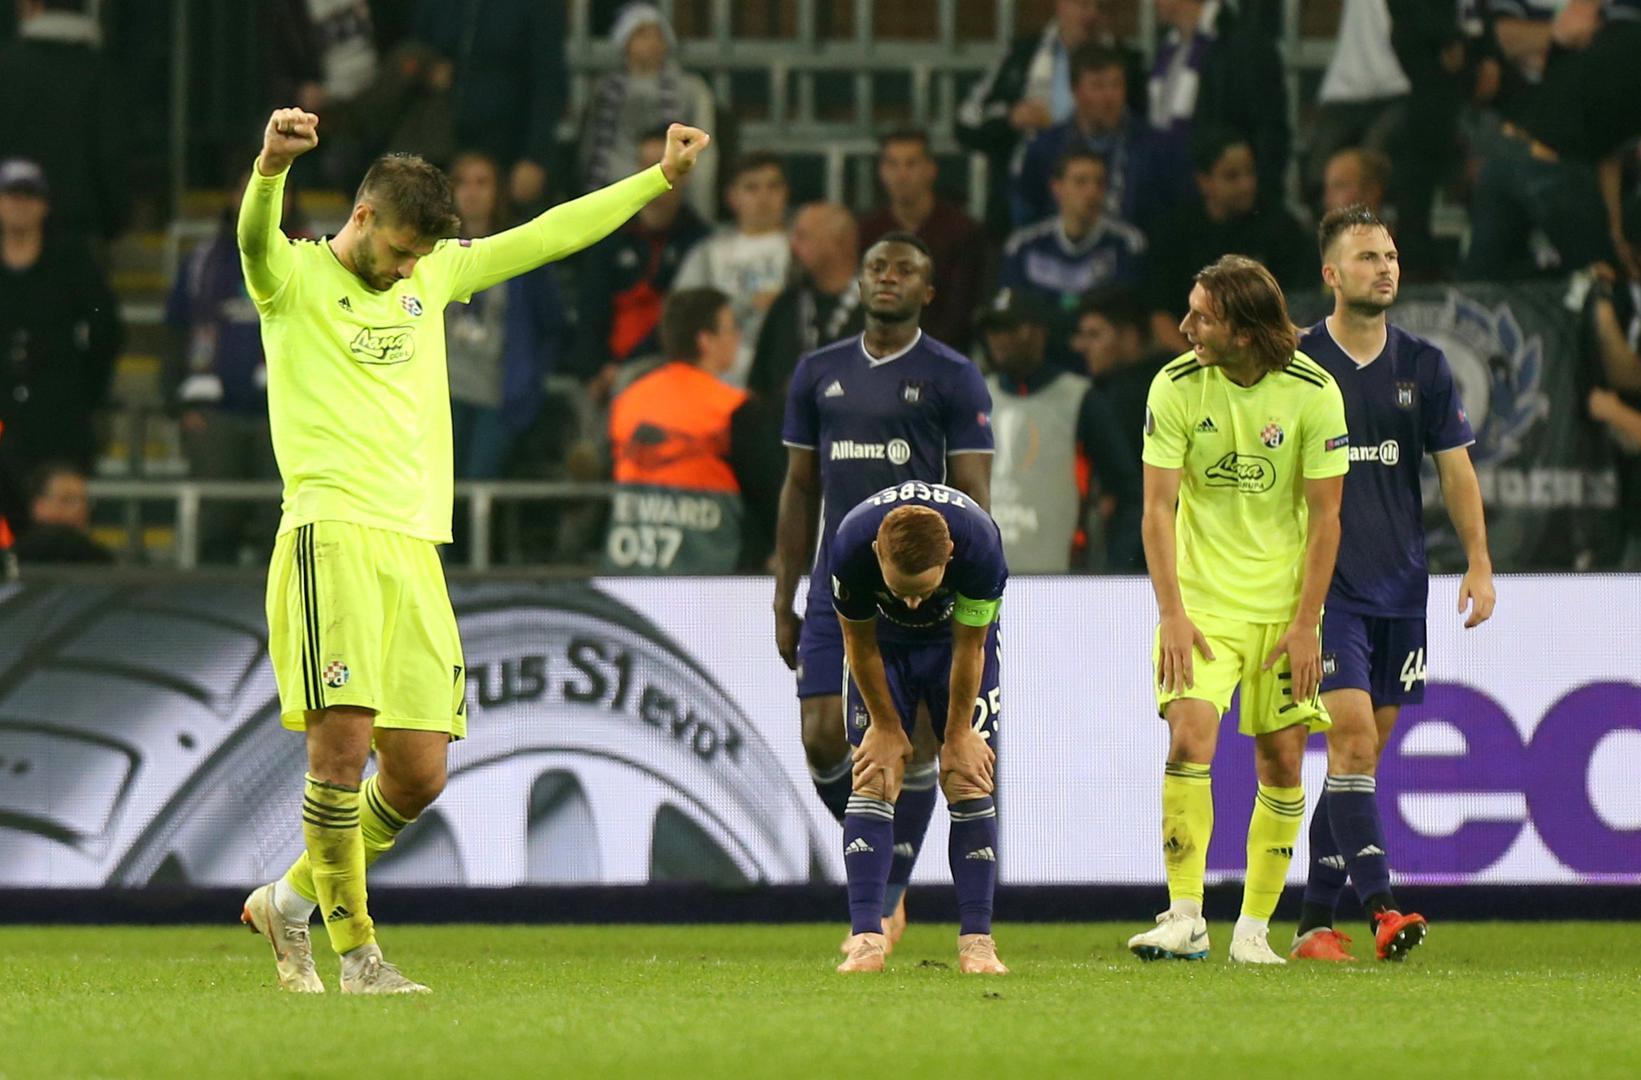 Dinamo konačno prekinuo prokletstvo! Pao je i Anderlecht